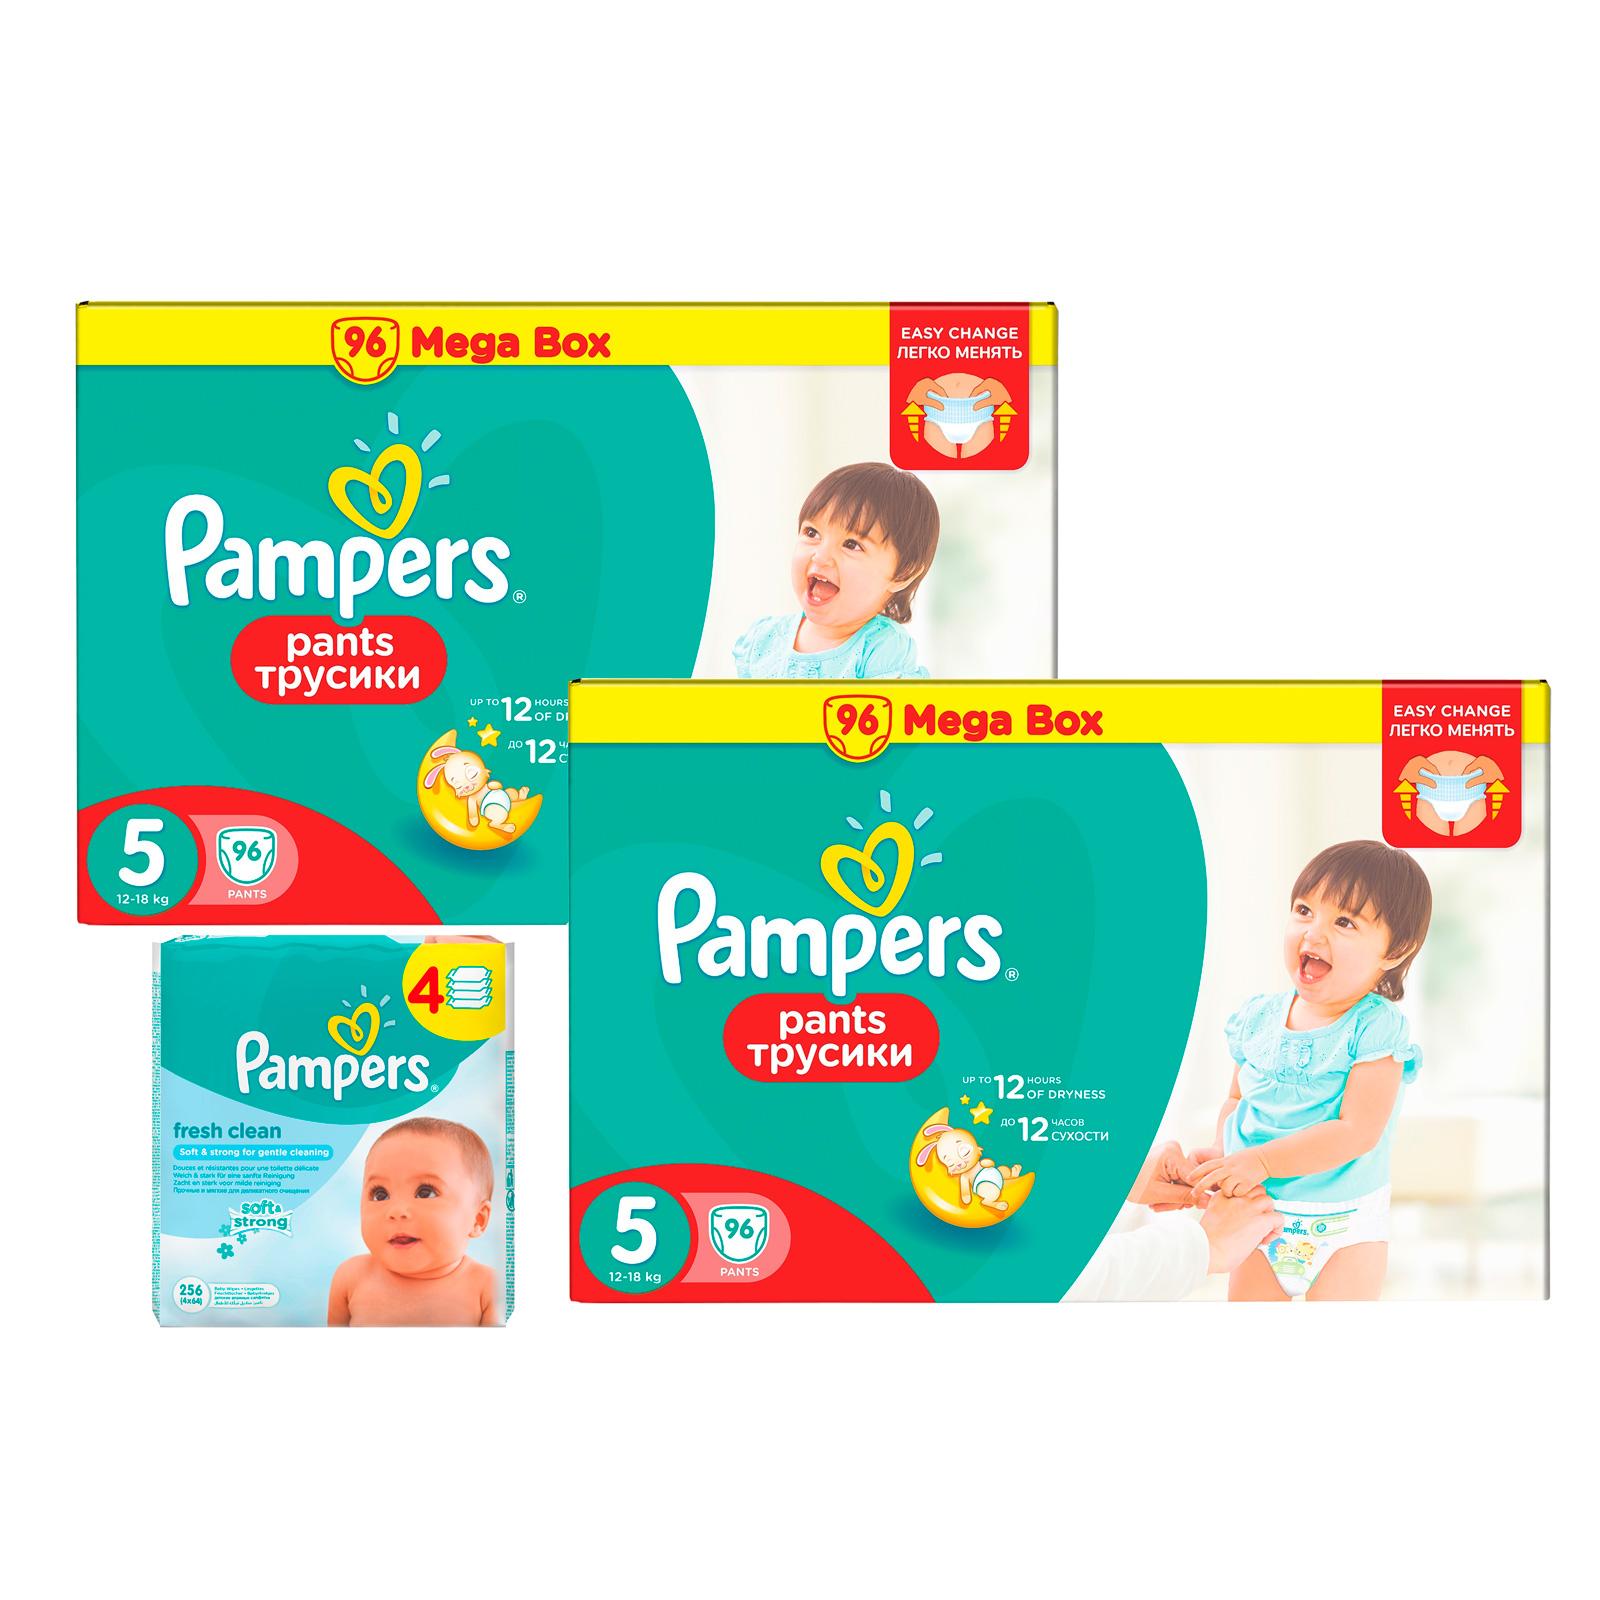 Набор Pampers №3 Трусики Pampers Pants 5 + салфетки<br>